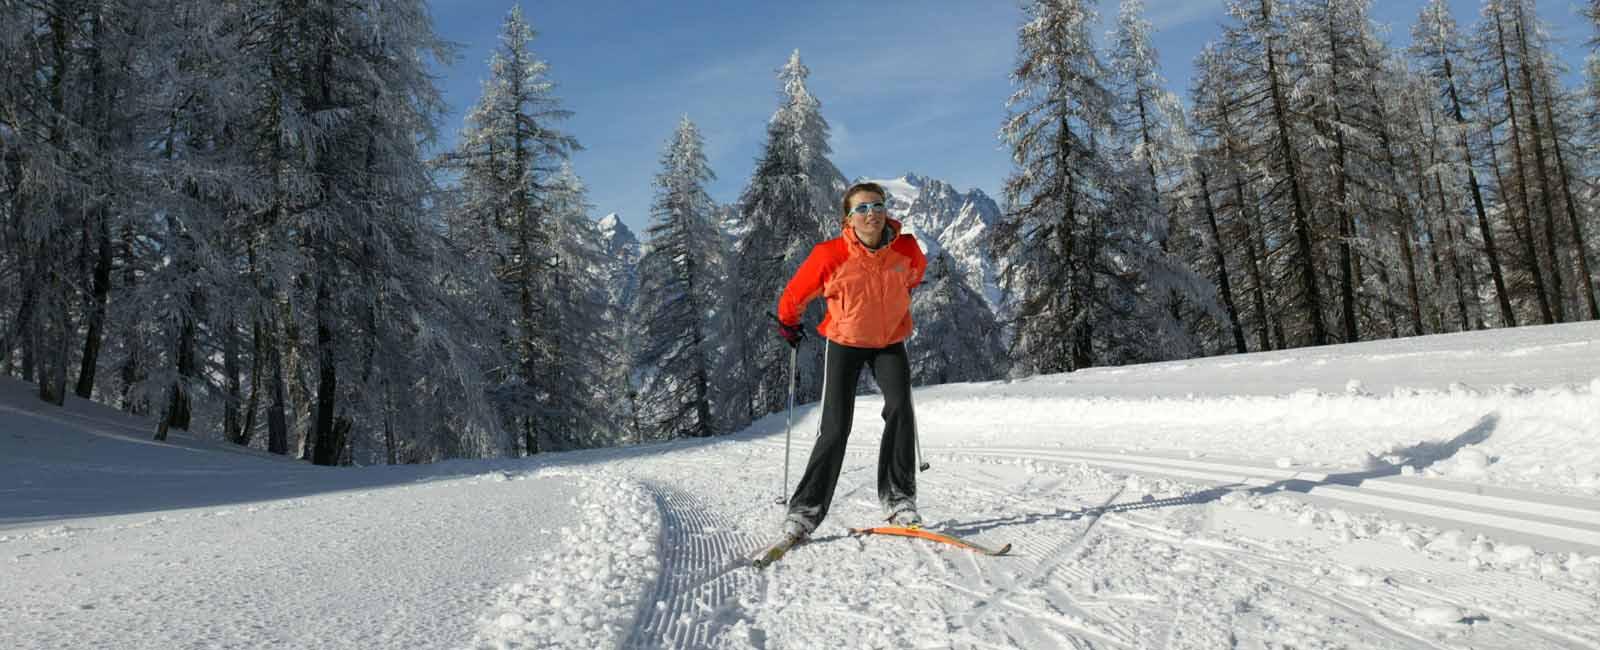 Ski de fond - Ski nordique Hautes-Alpes